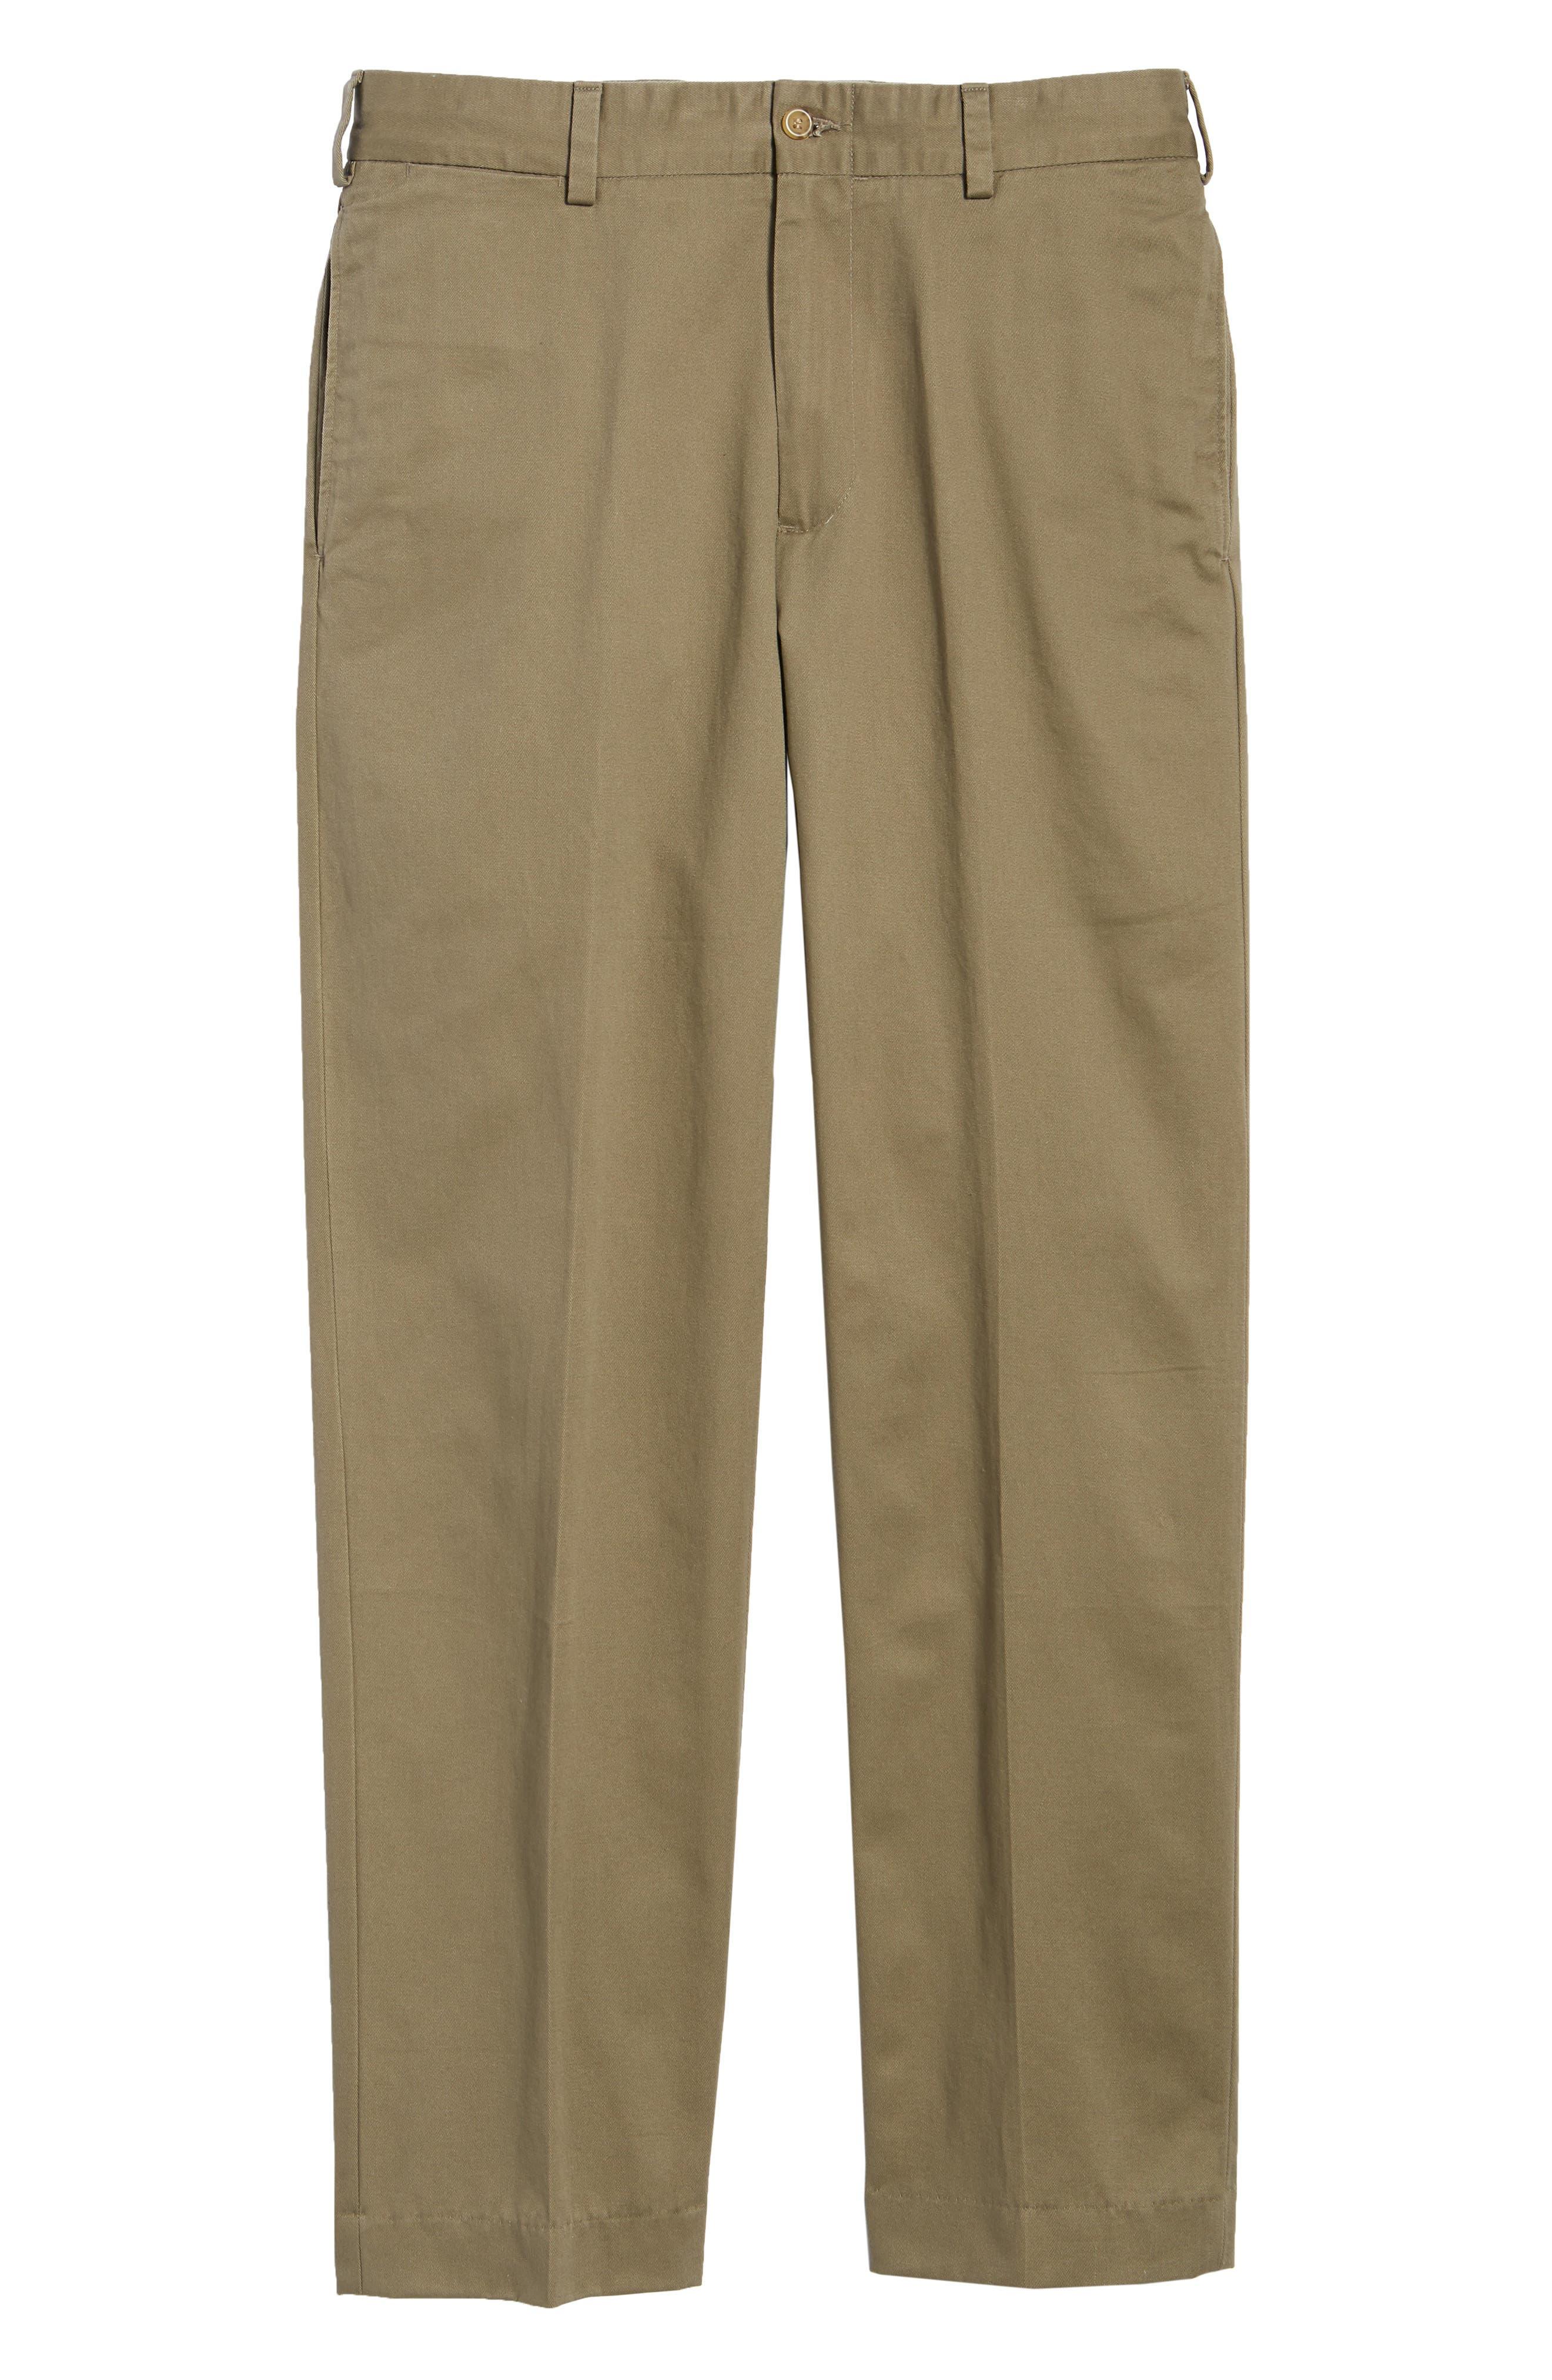 M2 Classic Fit Flat Front Vintage Twill Pants,                             Alternate thumbnail 6, color,                             330